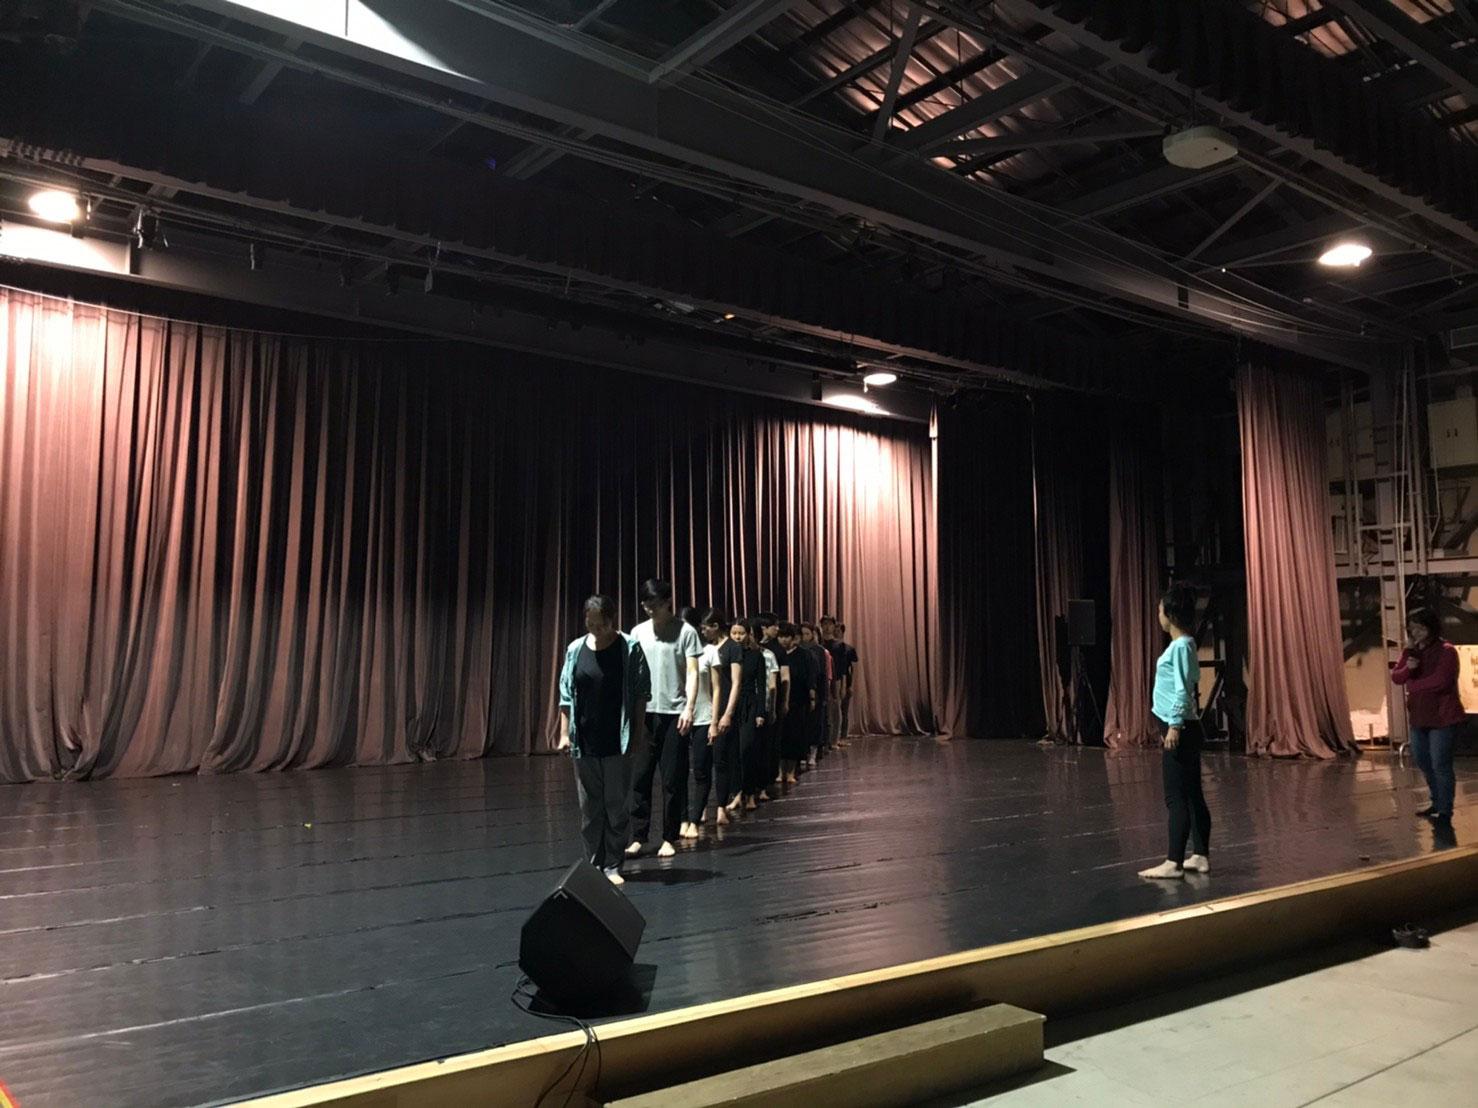 Shinehouse Arts Village's Performance Photo